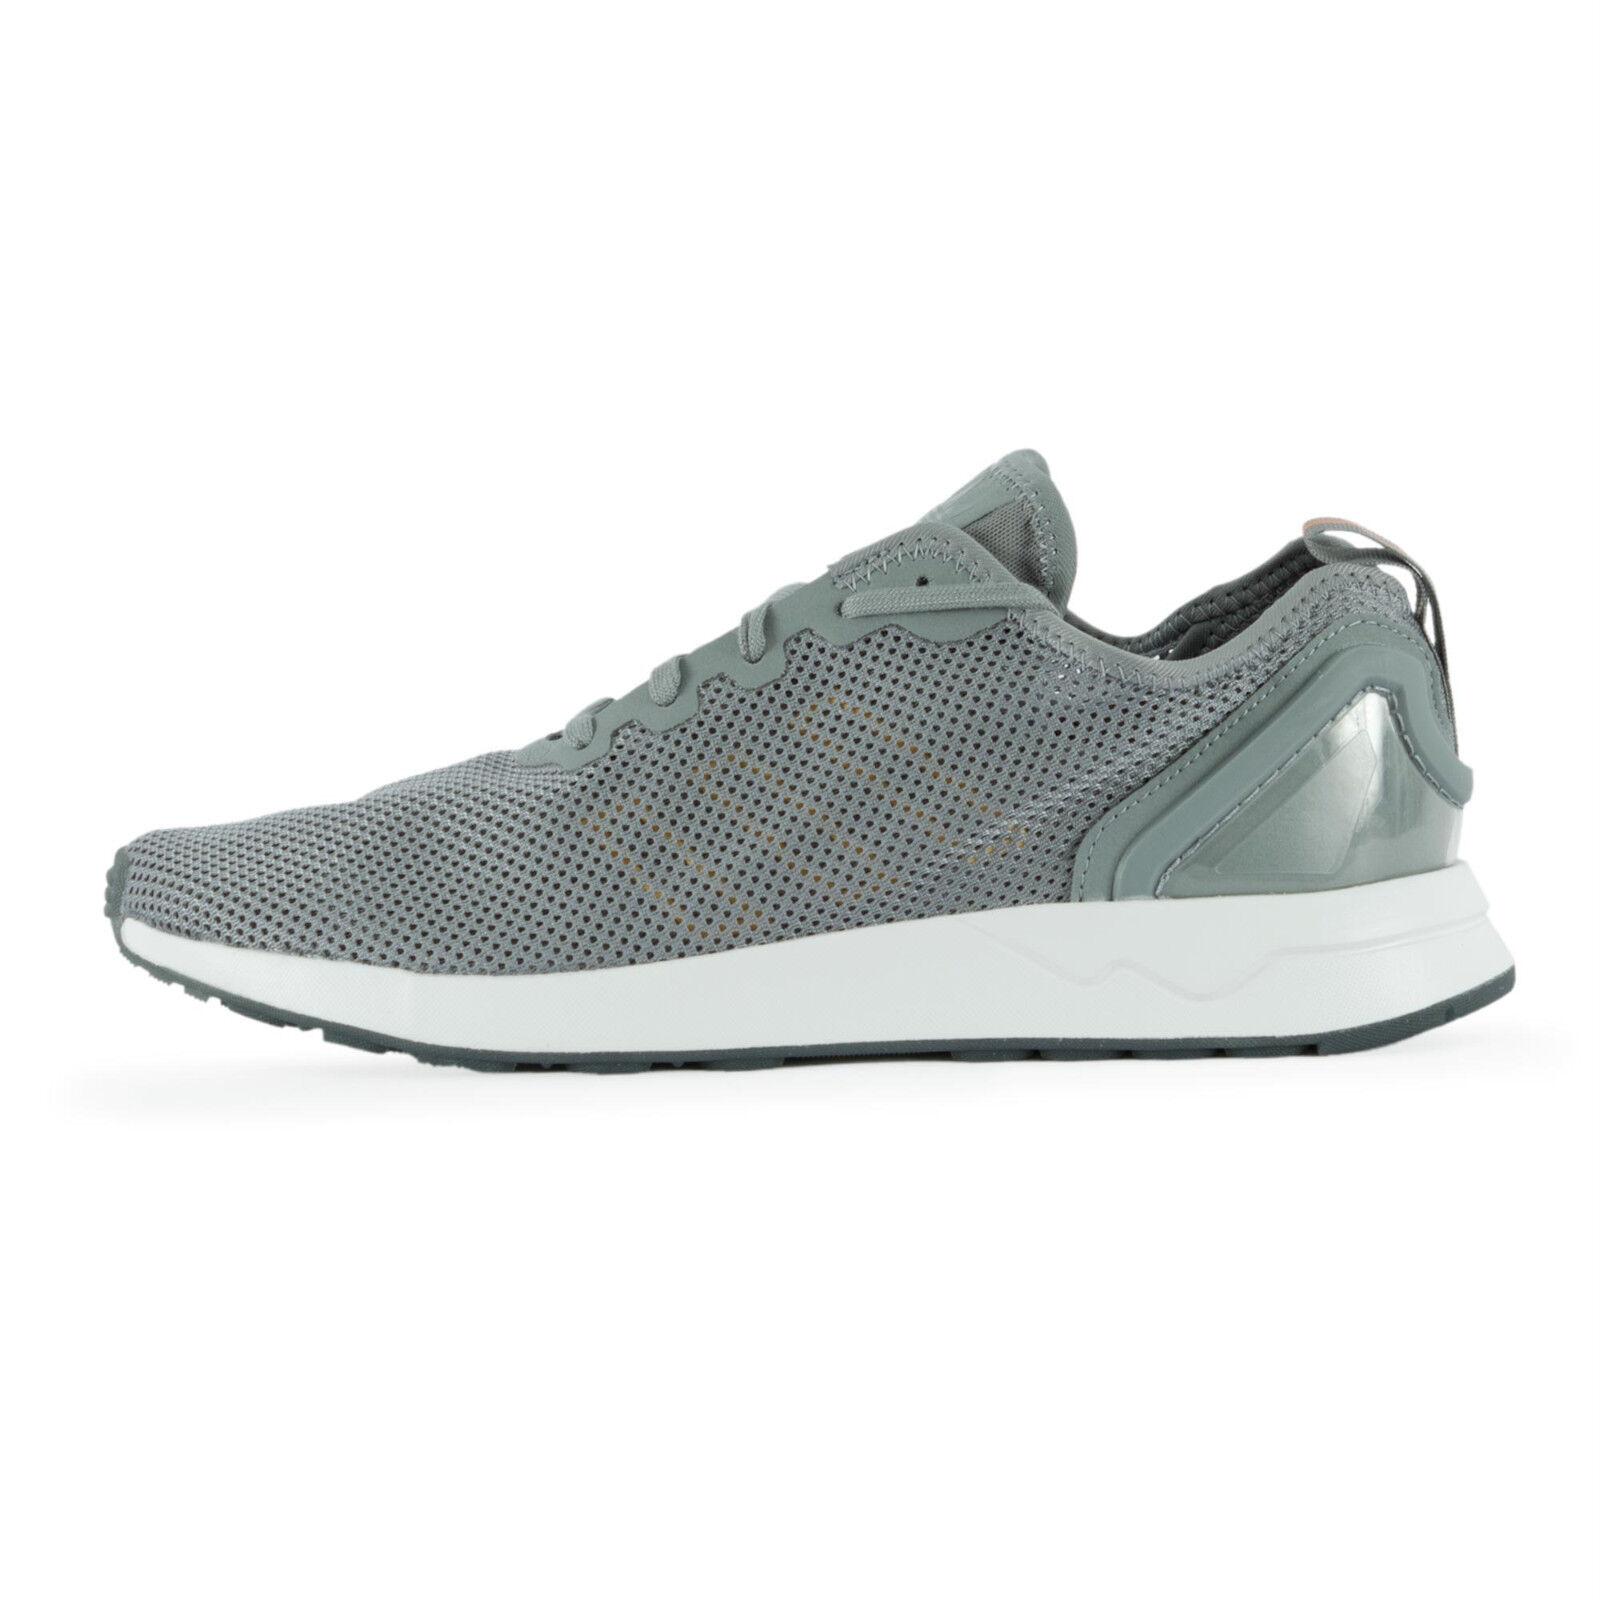 adidas Herren Sneaker S76554 ZX Flux ADV SL Grey / 40 2/3 (40) / Turnschuhe